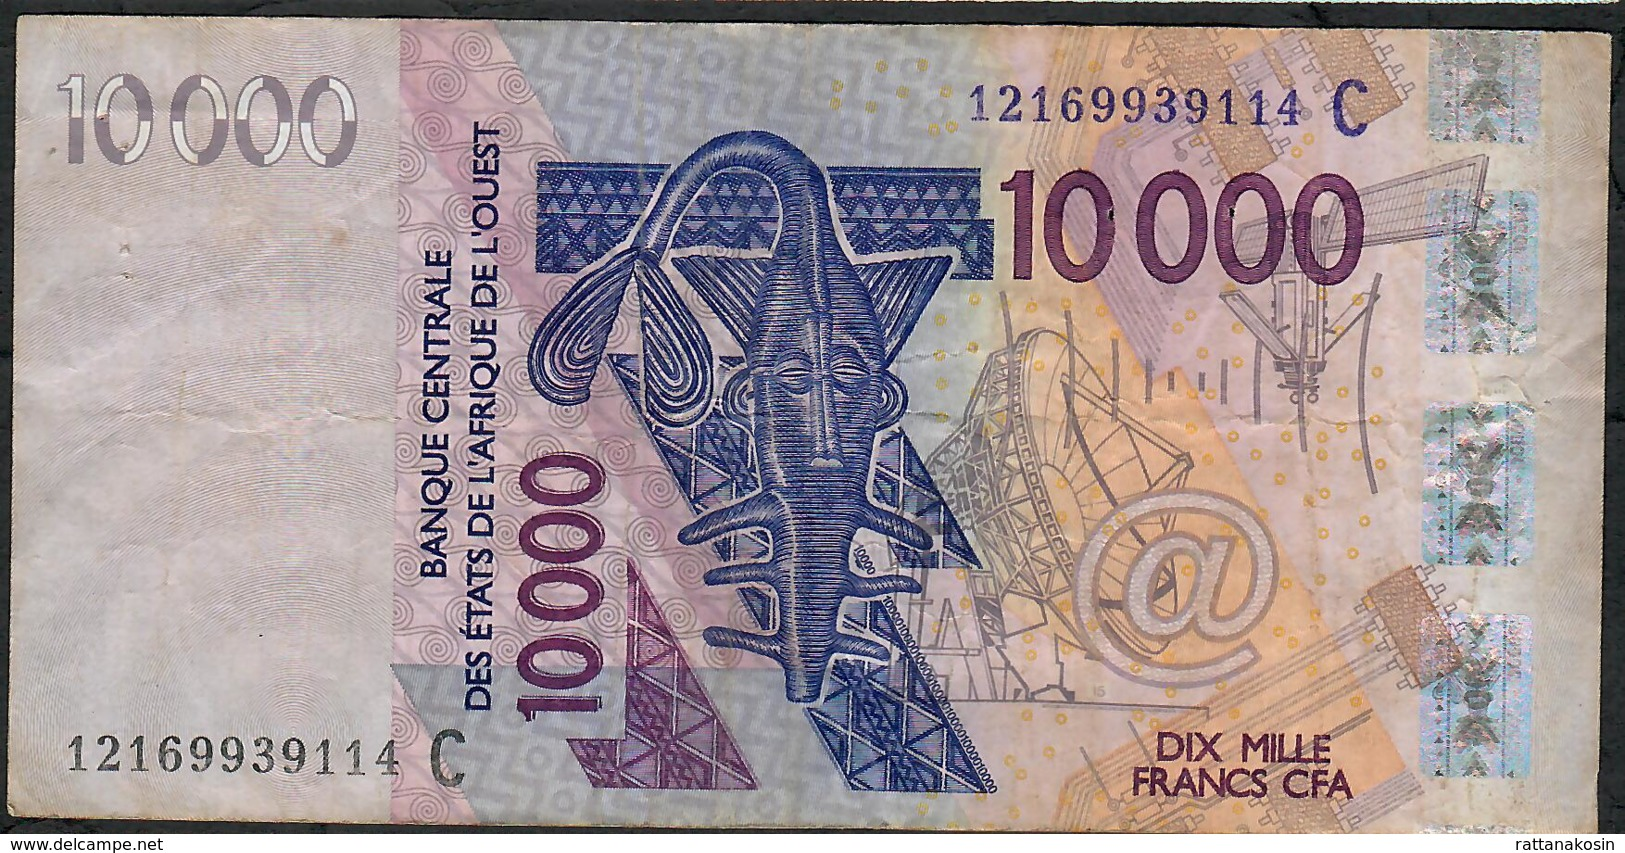 W.A.S. BURKINA FASO P318Cl 10.000 FRANCS (20)12 VF 2 P.h. - Burkina Faso